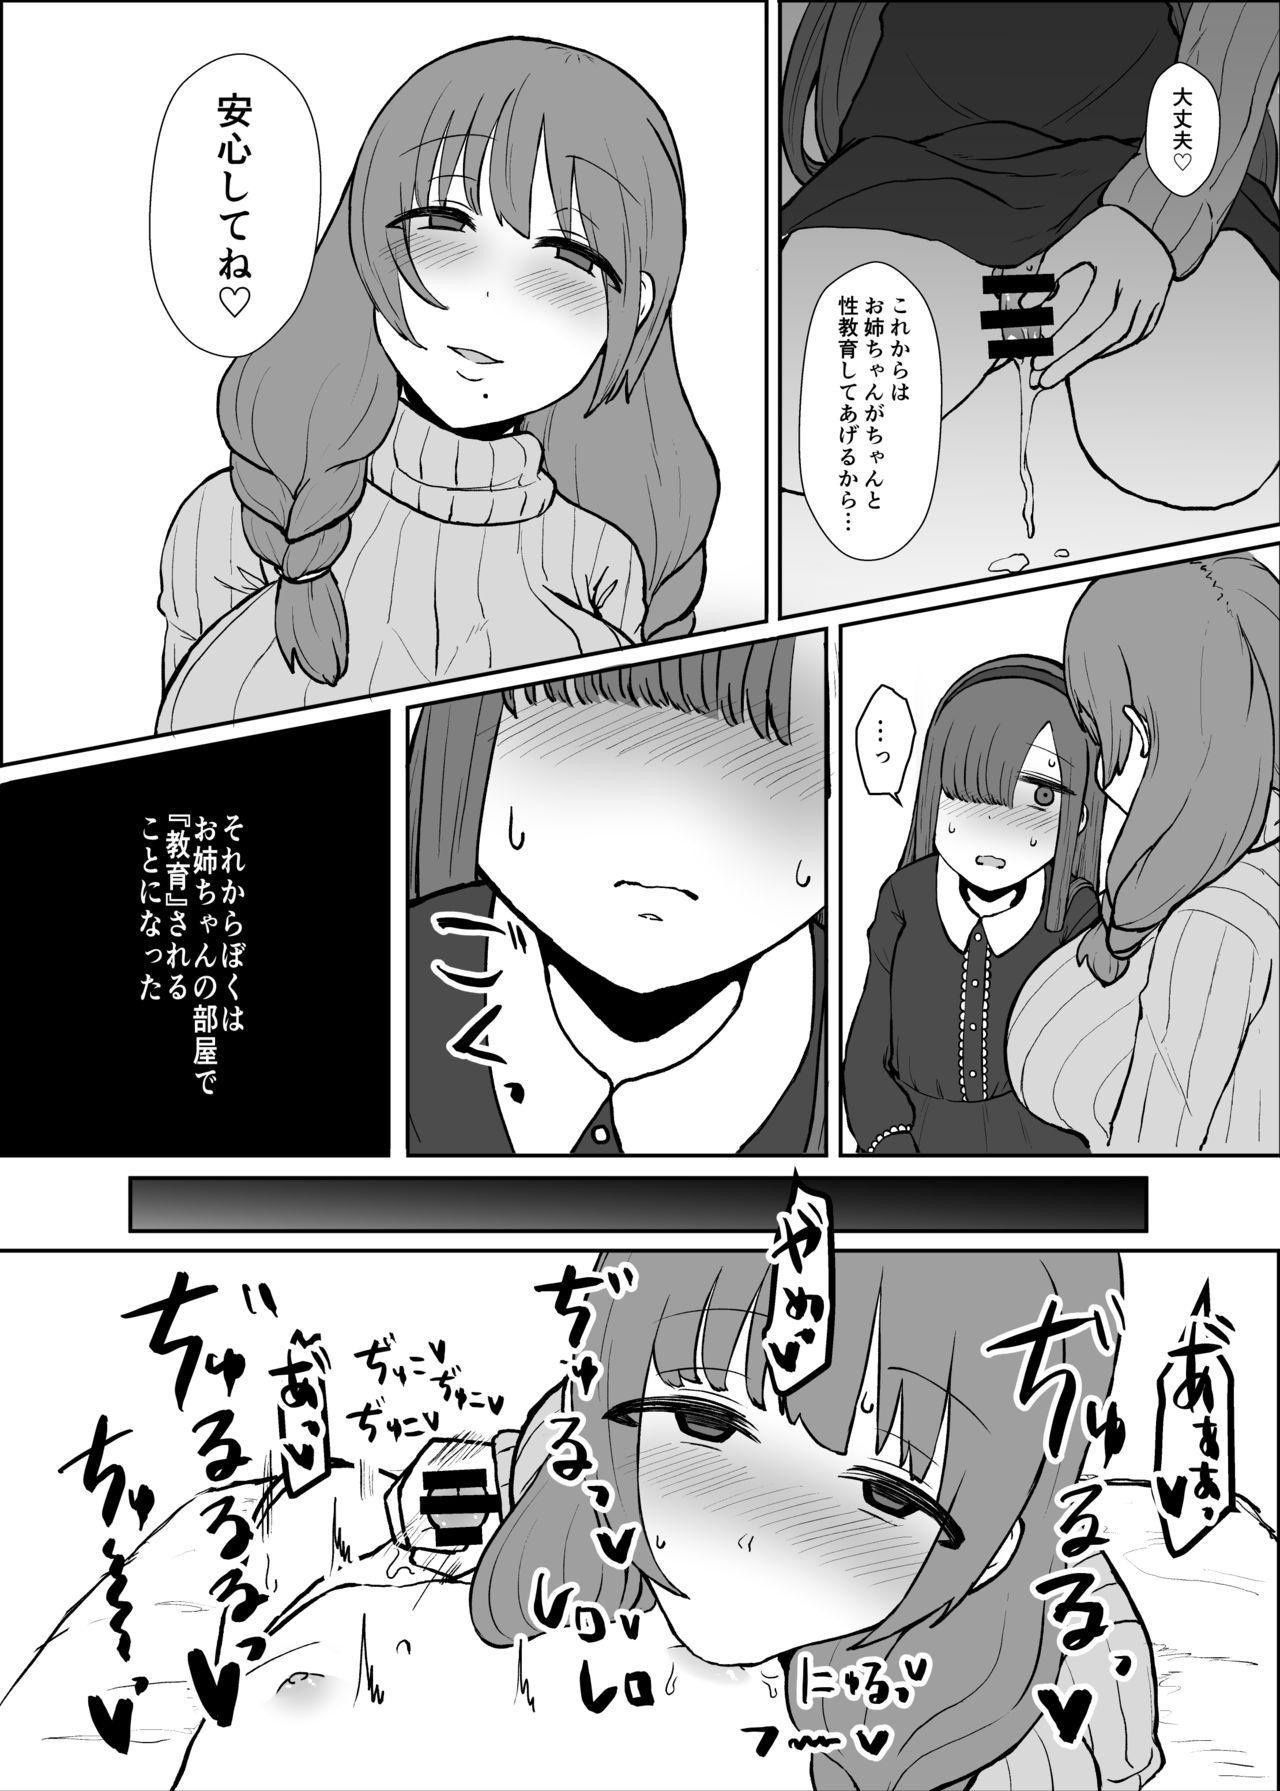 Onee-chan no Heya 11